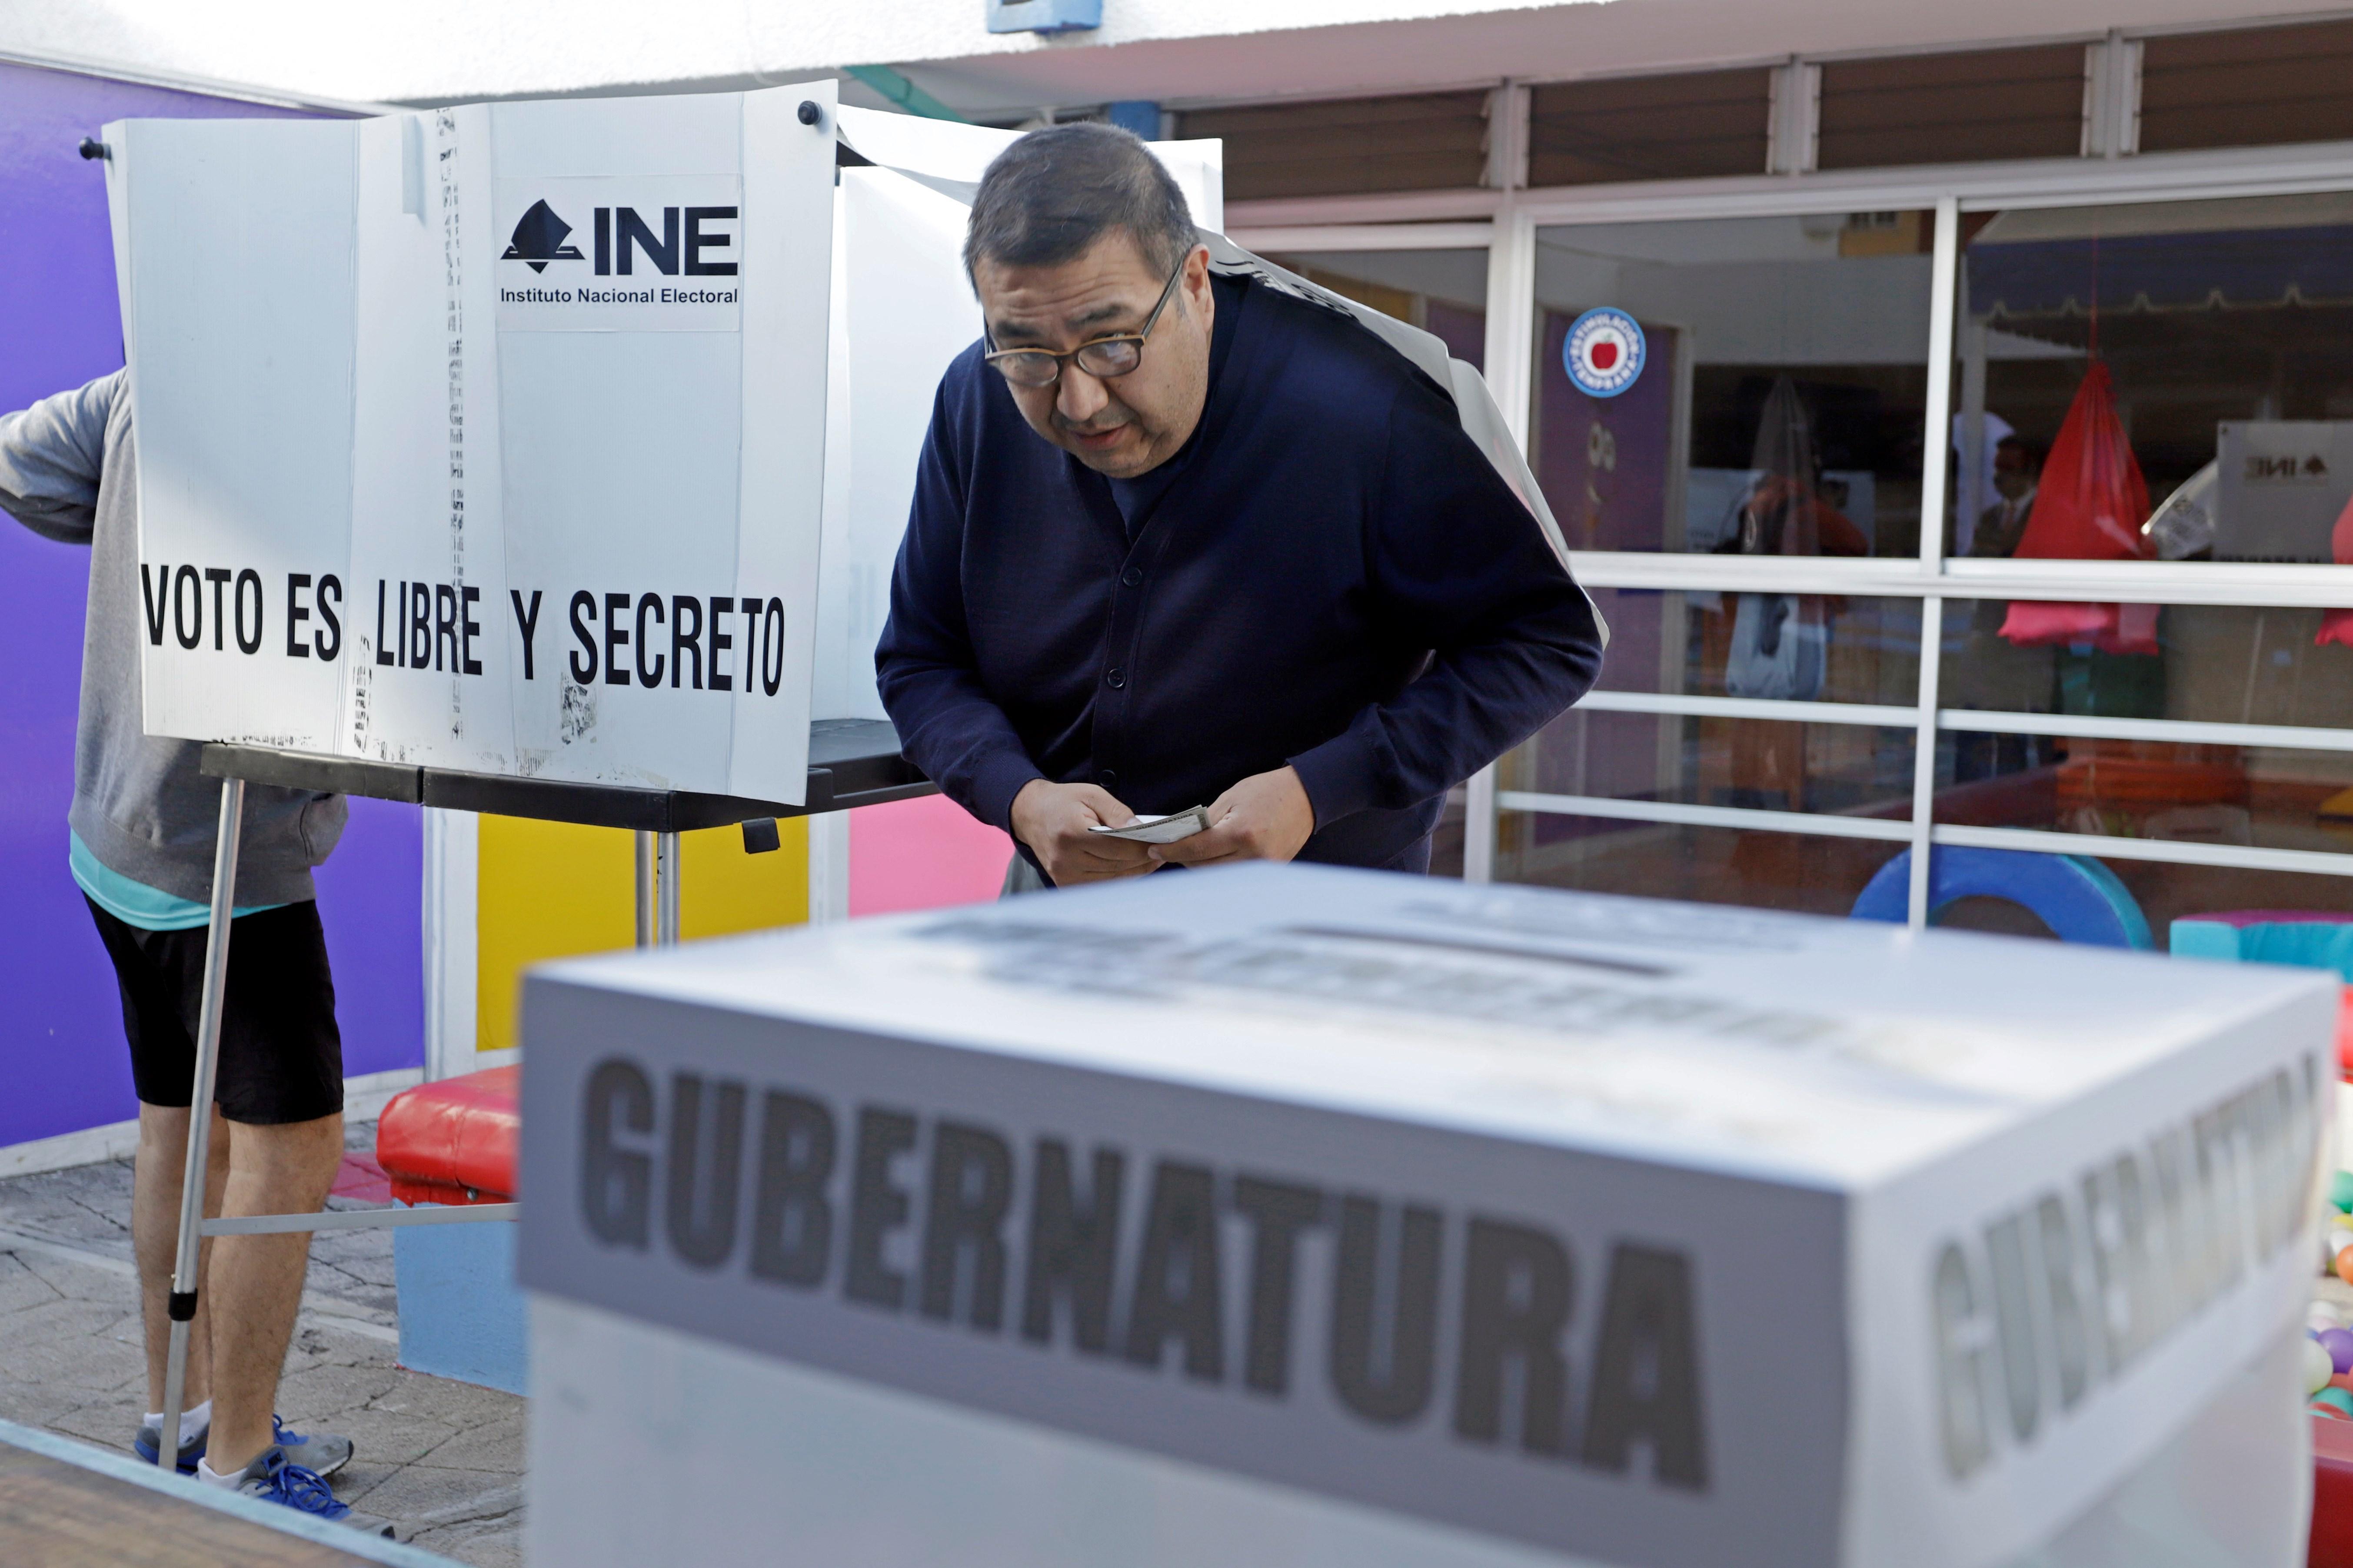 Ine Califica De Exitosa La Jornada Electoral Fede Reporta